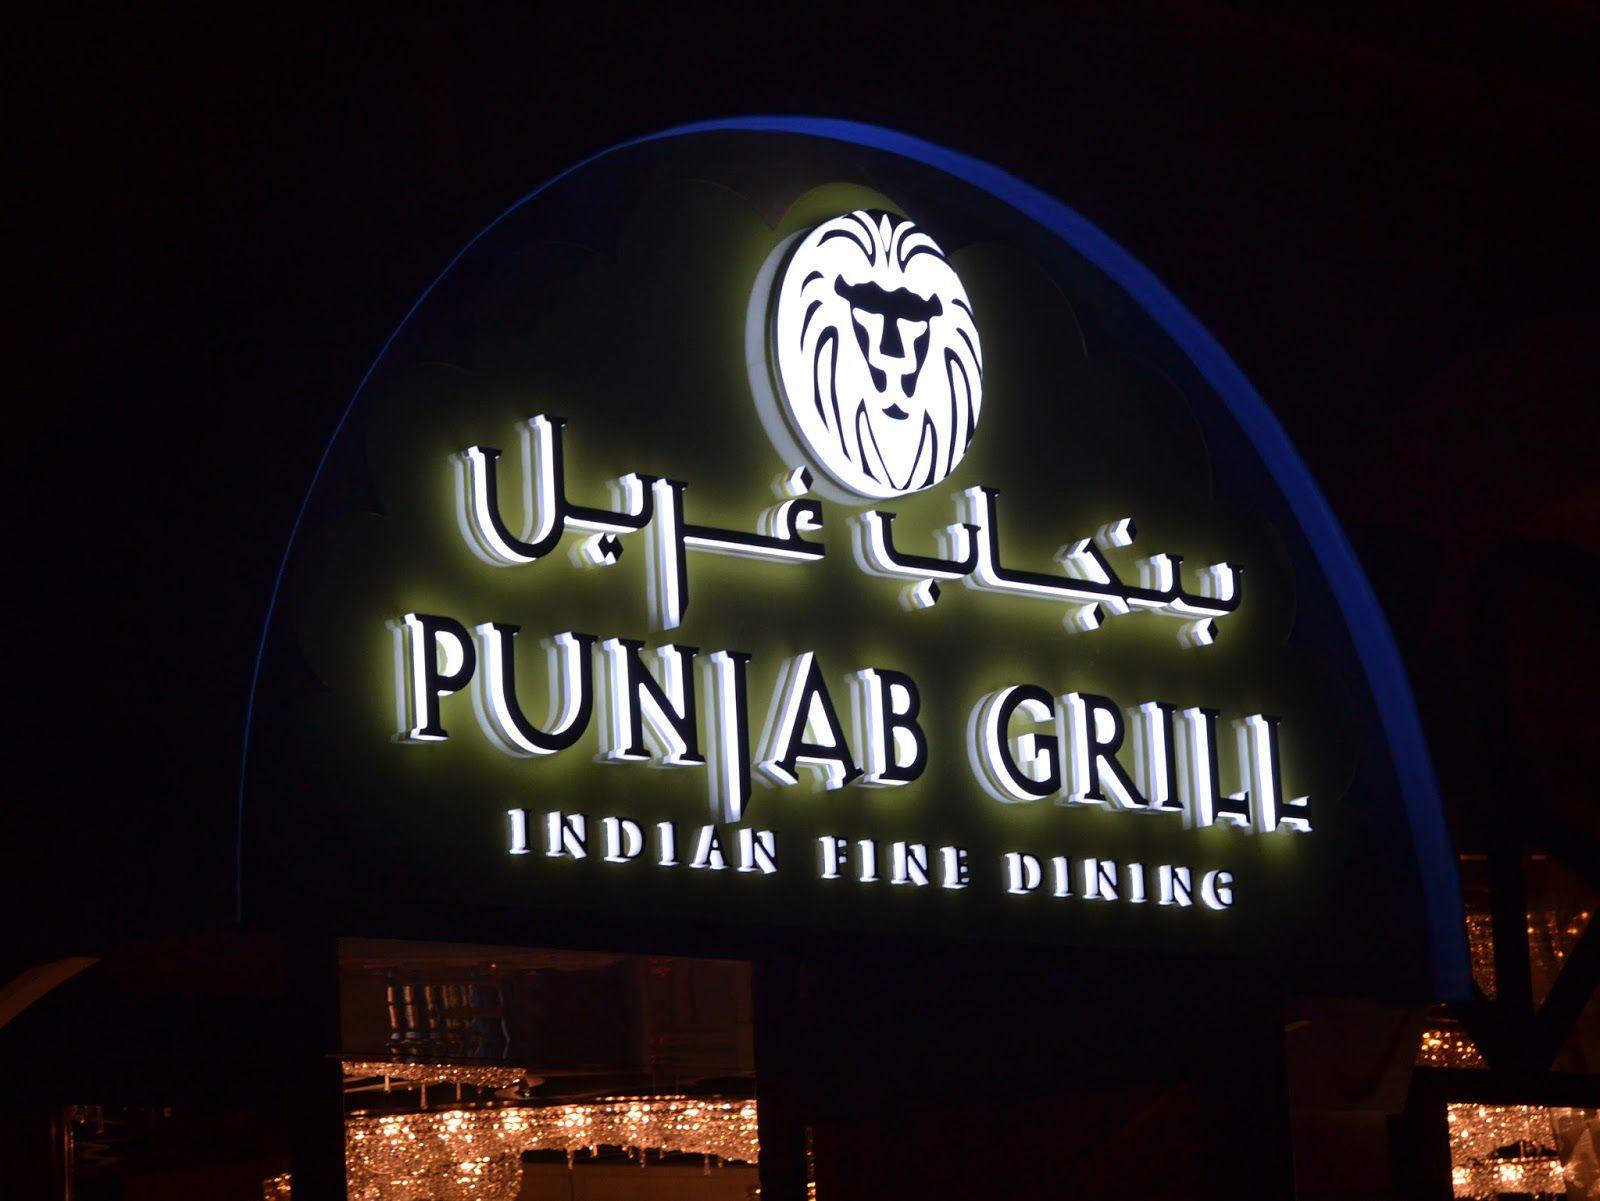 مطعم Punjab Grill